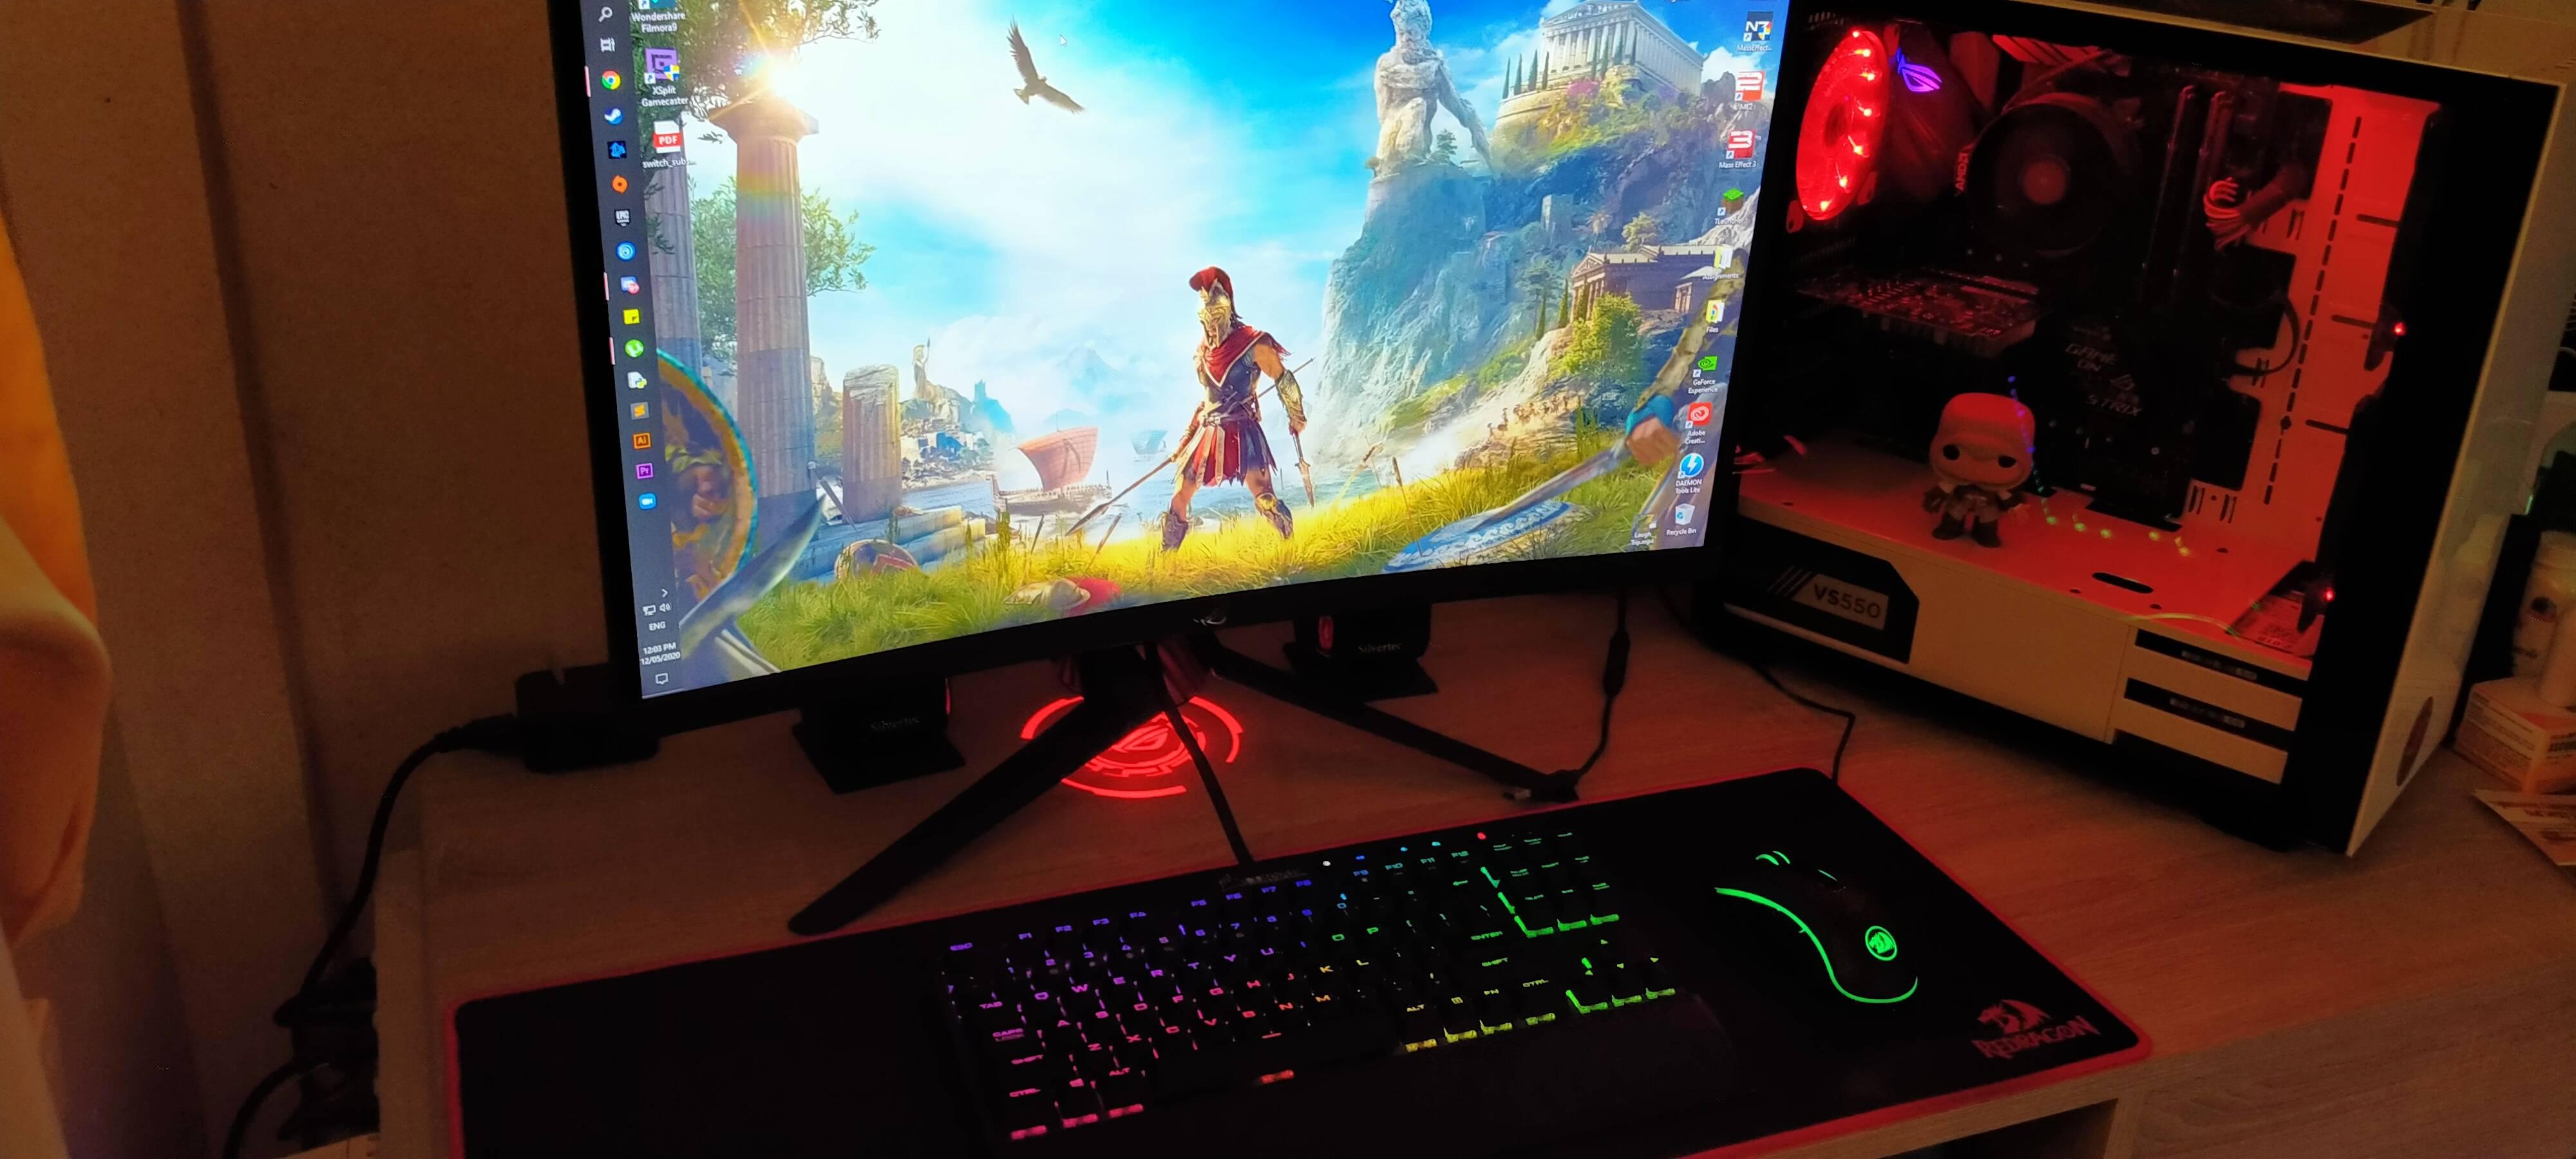 YoloMD1498's Setup - Gaming/Productivity   Scooget